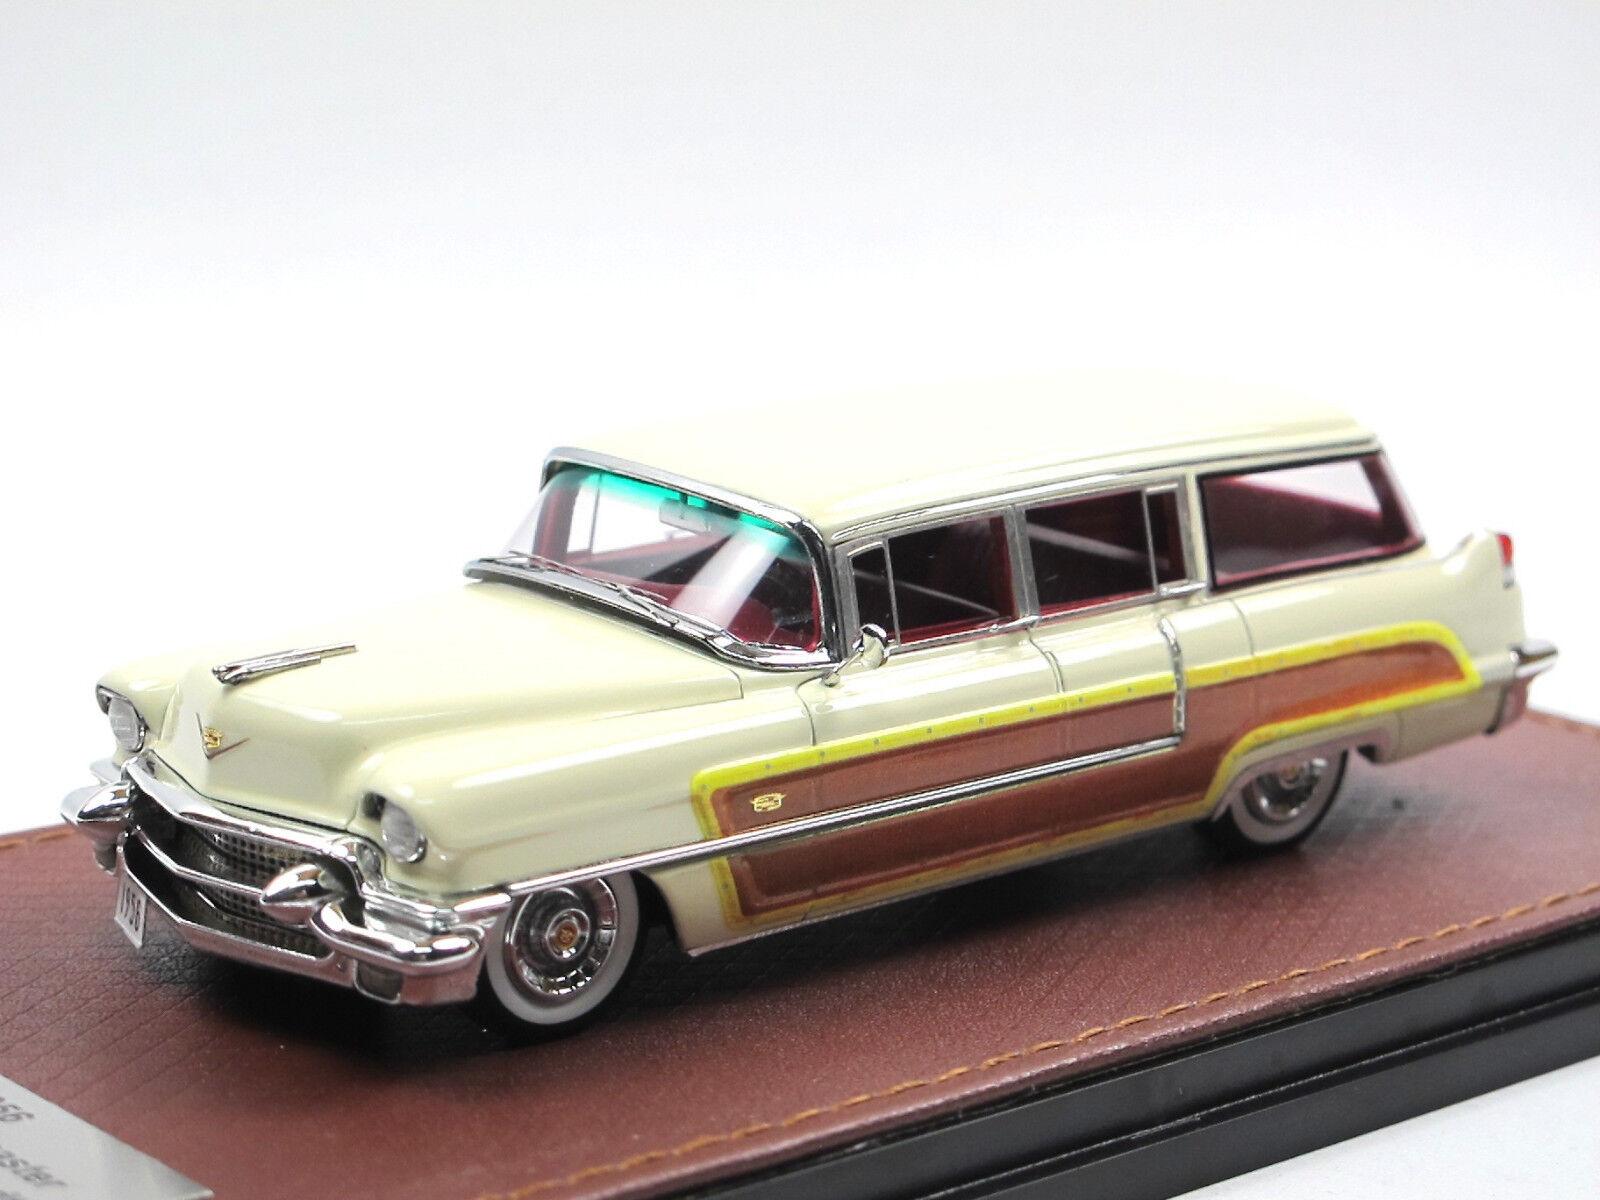 acquistare ora GLM 1956 Cadillac Series 62 62 62 Viewmaster by Hess + Eisenhardt Woodie Cream 1 43  risparmiare sulla liquidazione